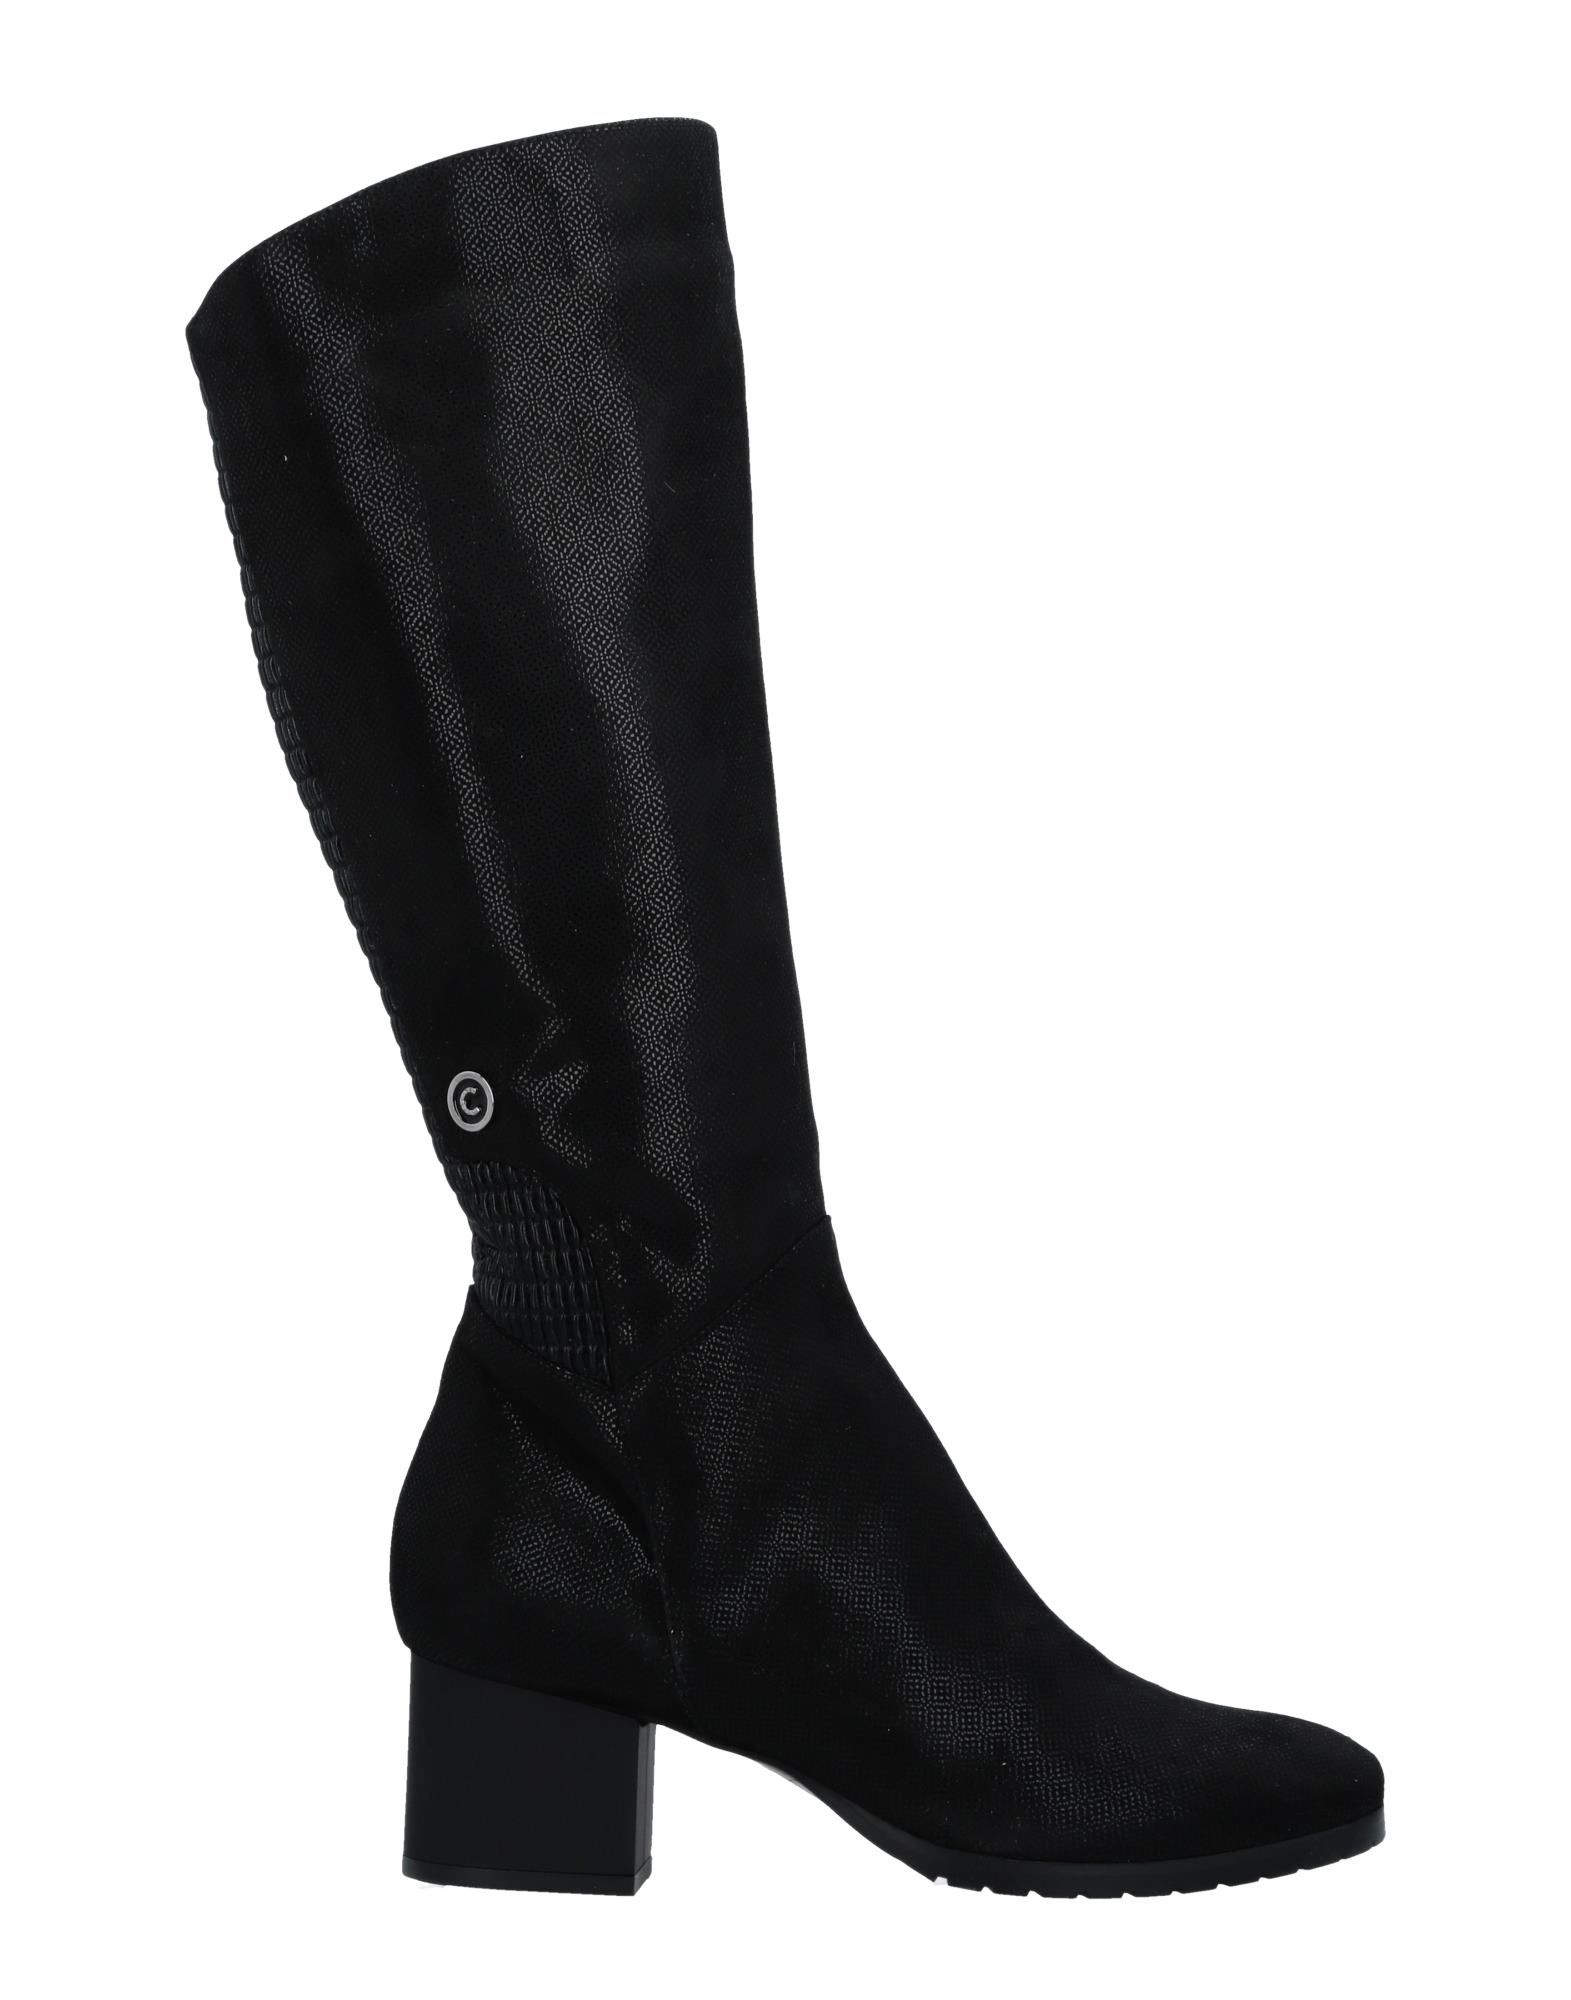 Rabatt Schuhe 11517584QG Conni Stiefel Damen  11517584QG Schuhe 0c1209